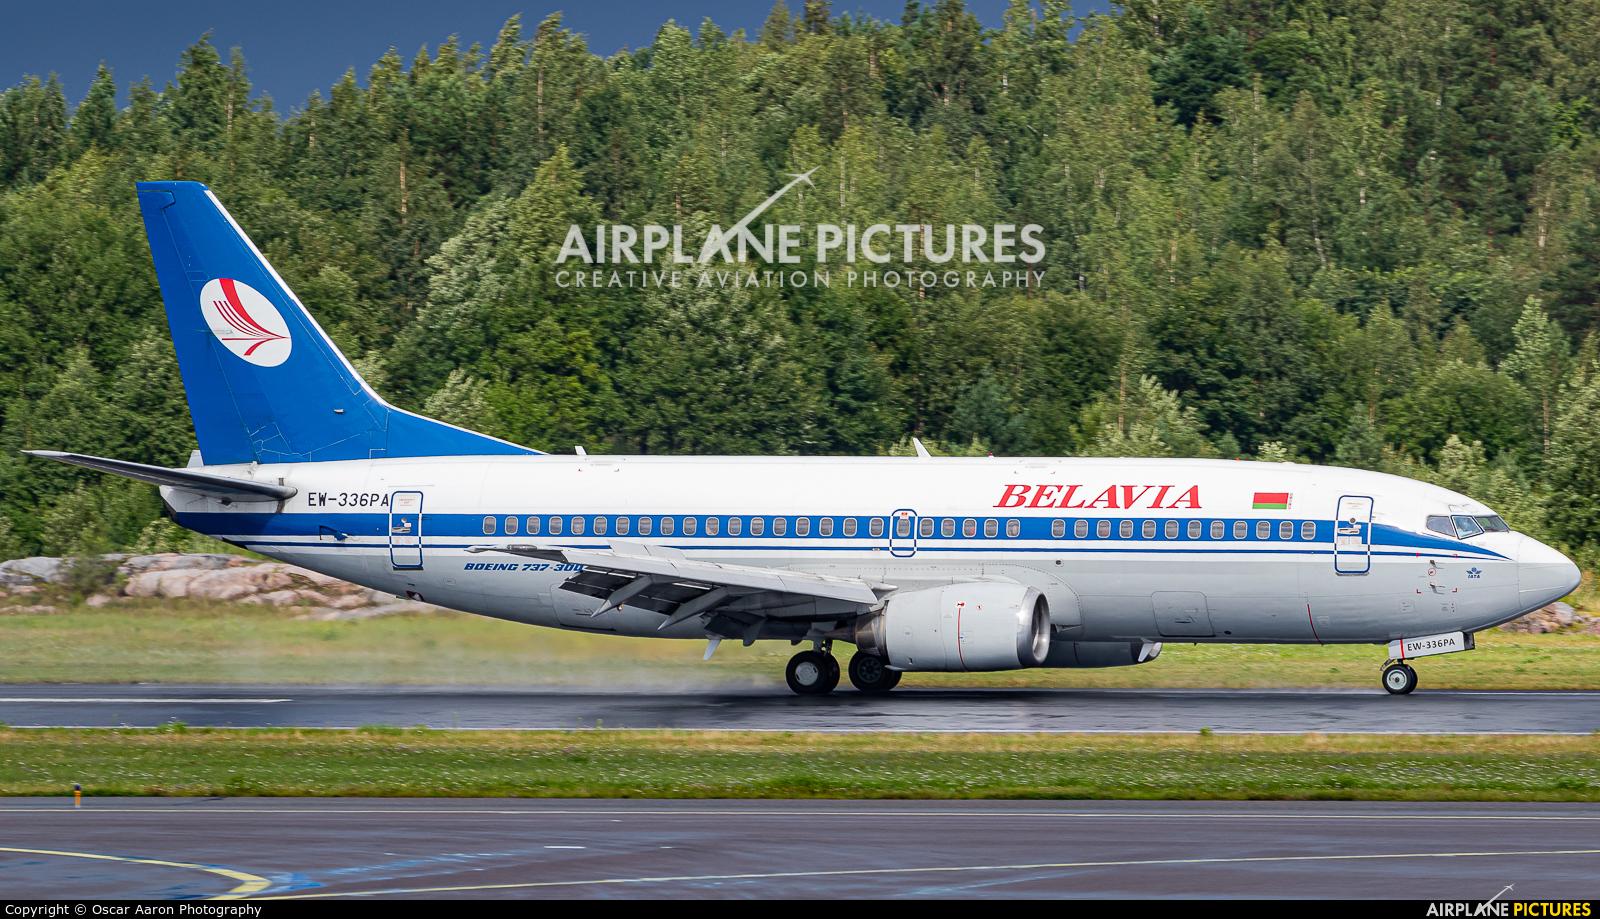 Belavia EW-336PA aircraft at Helsinki - Vantaa